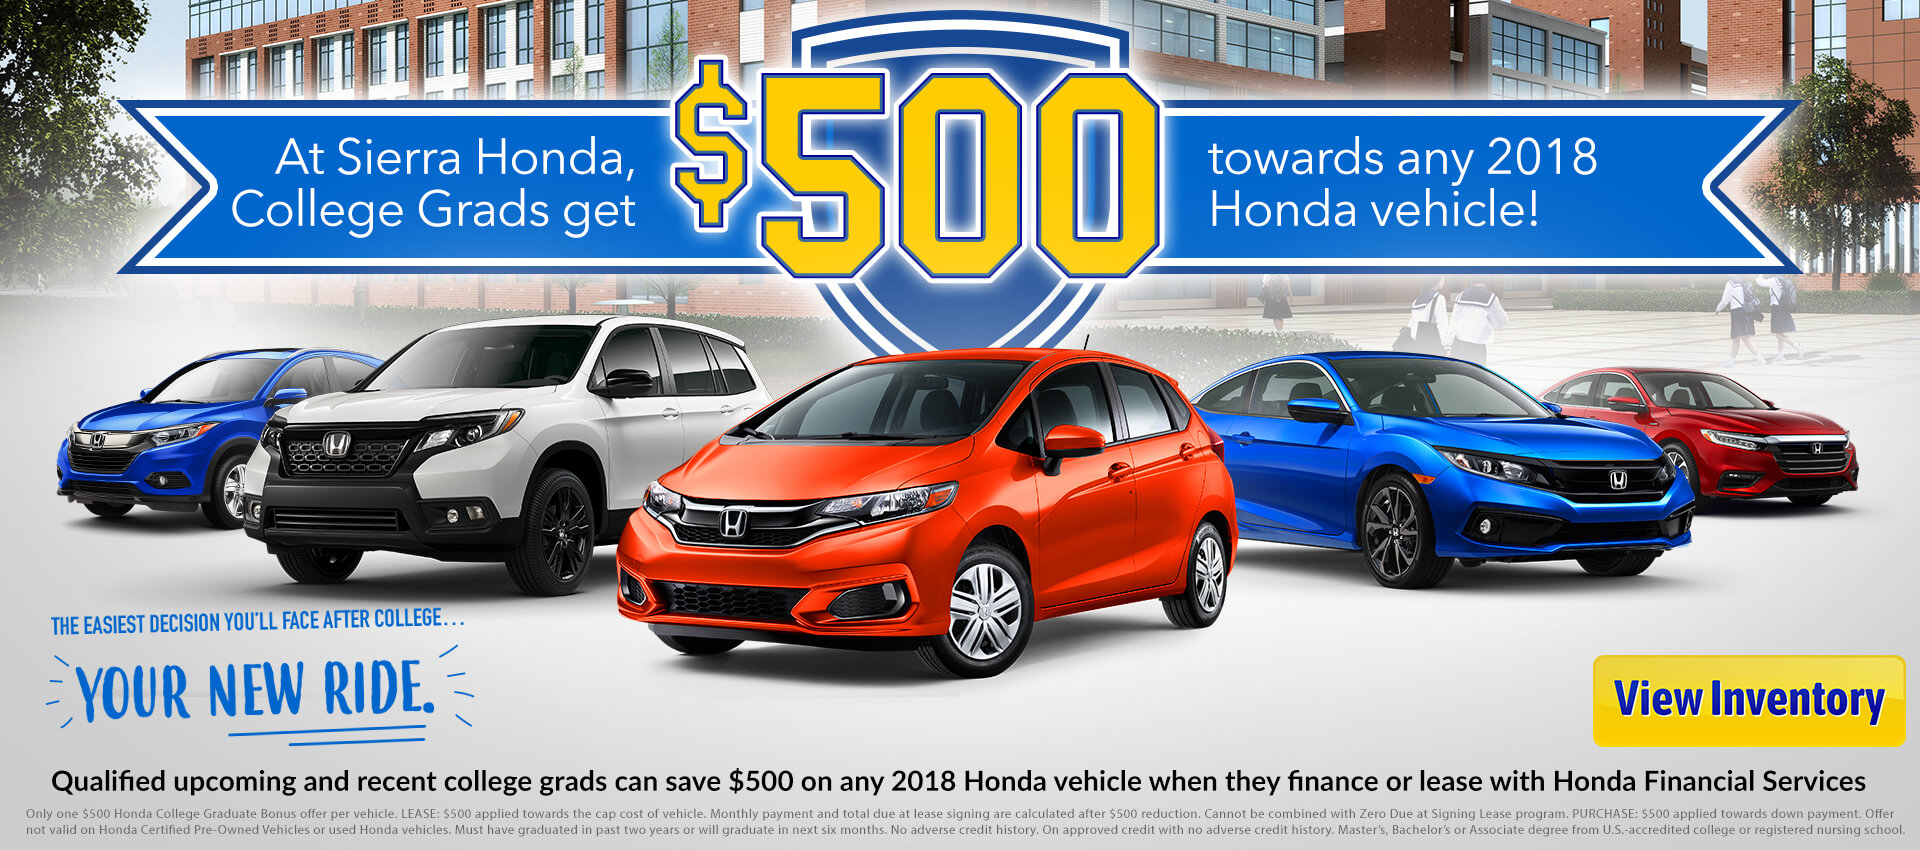 At Sierra Honda, Colelge Grads get $500 towards any 2019 Vehicle!